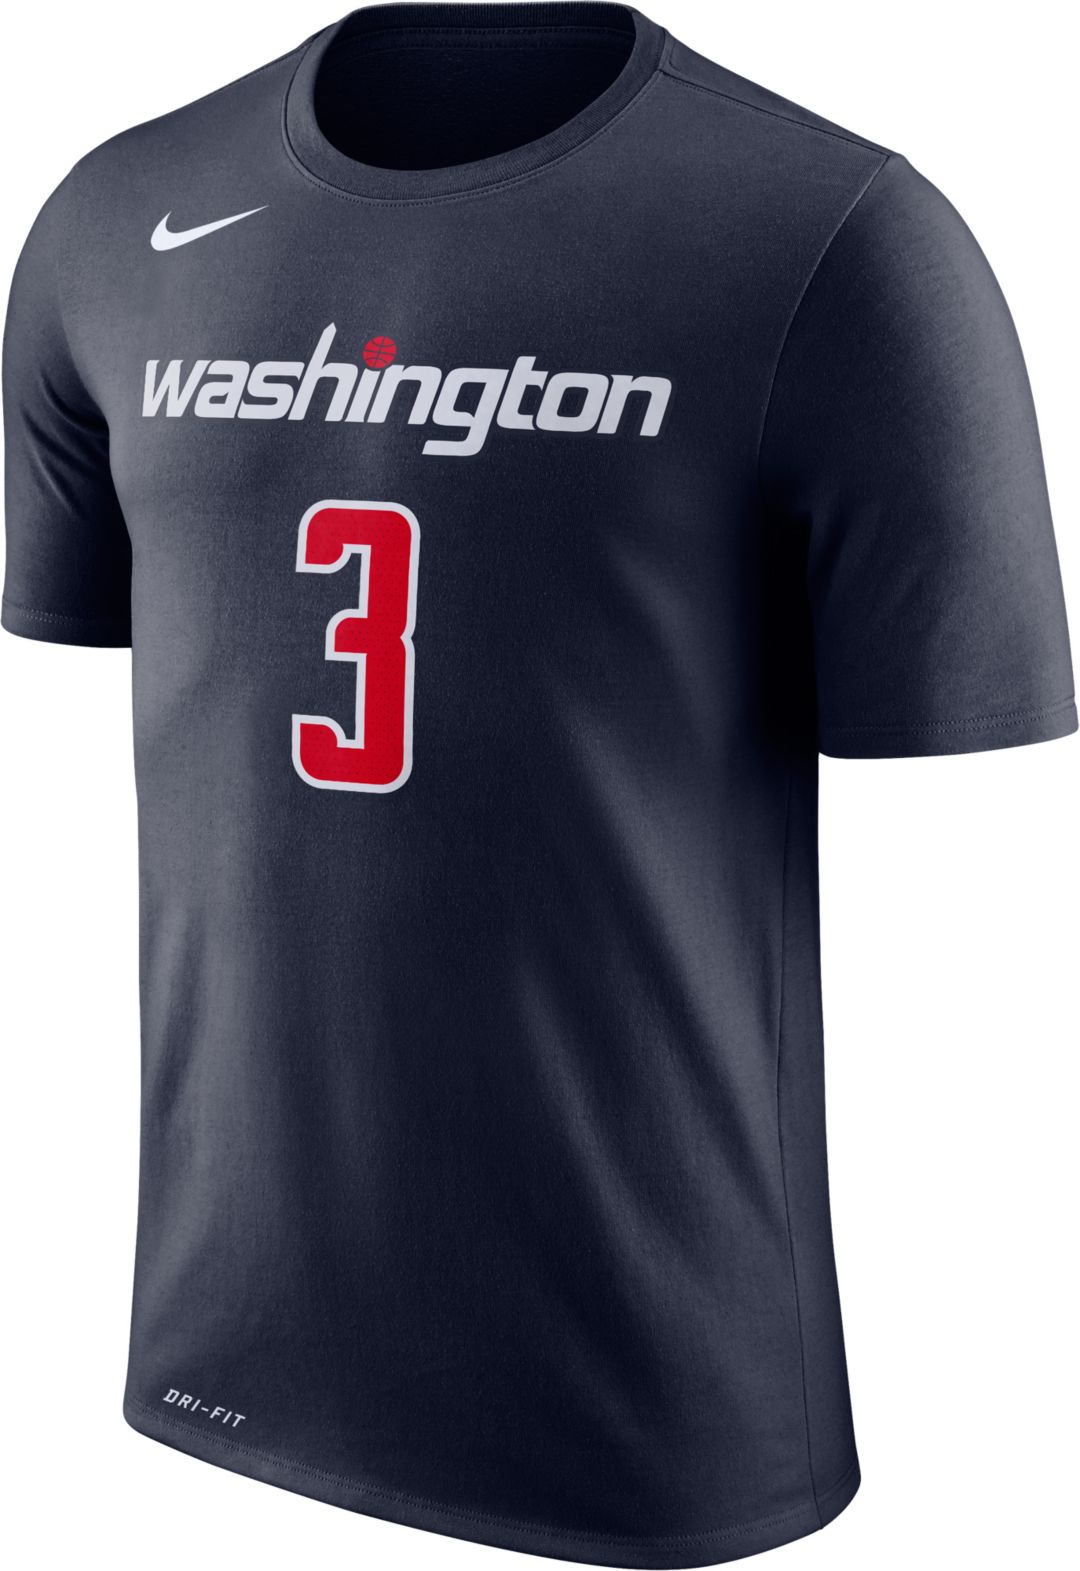 new product 33937 02105 Nike Men's Washington Wizards Bradley Beal #3 Dri-FIT Navy T-Shirt